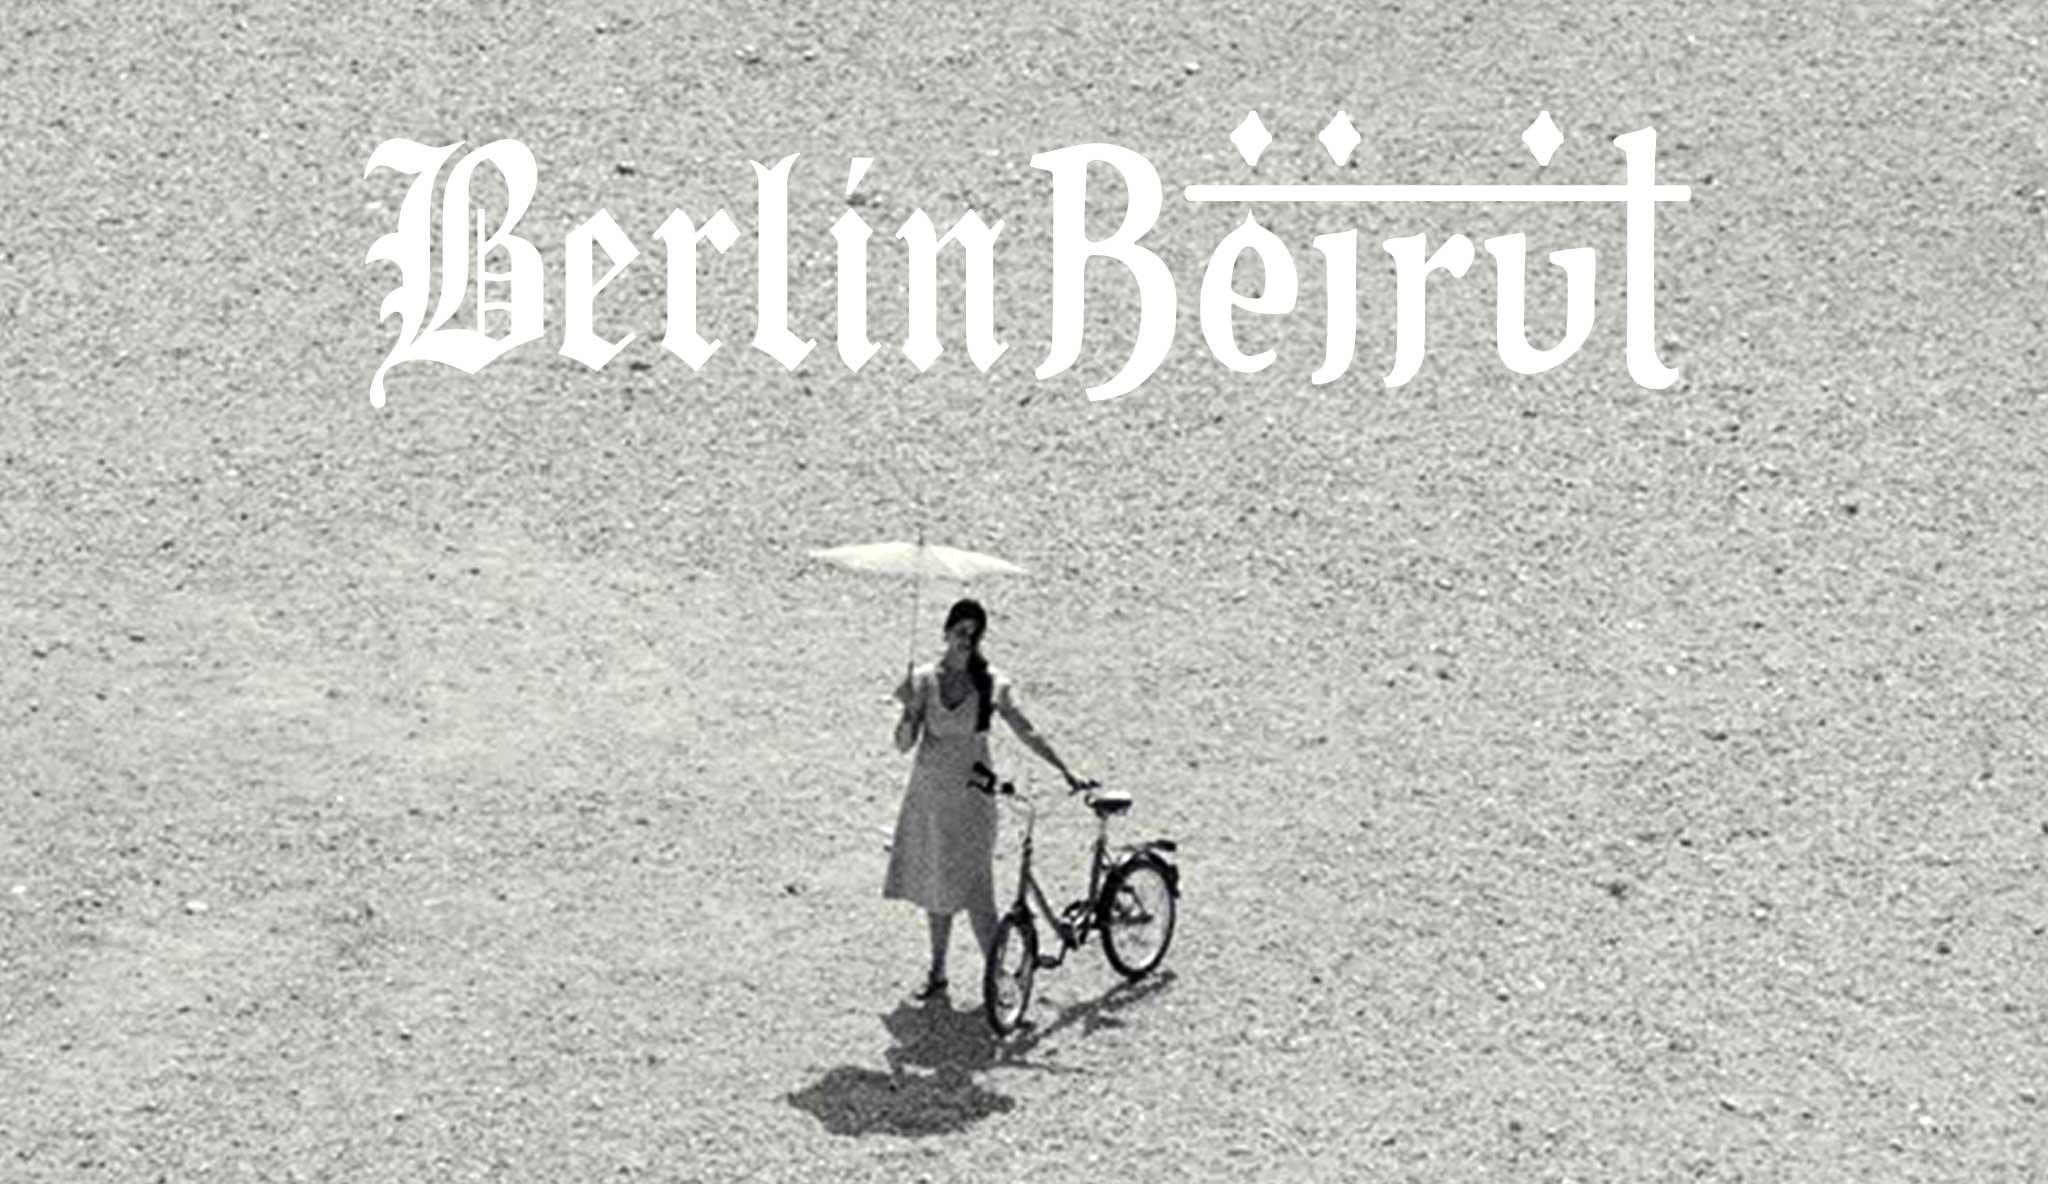 berlinbeirut\header.jpg